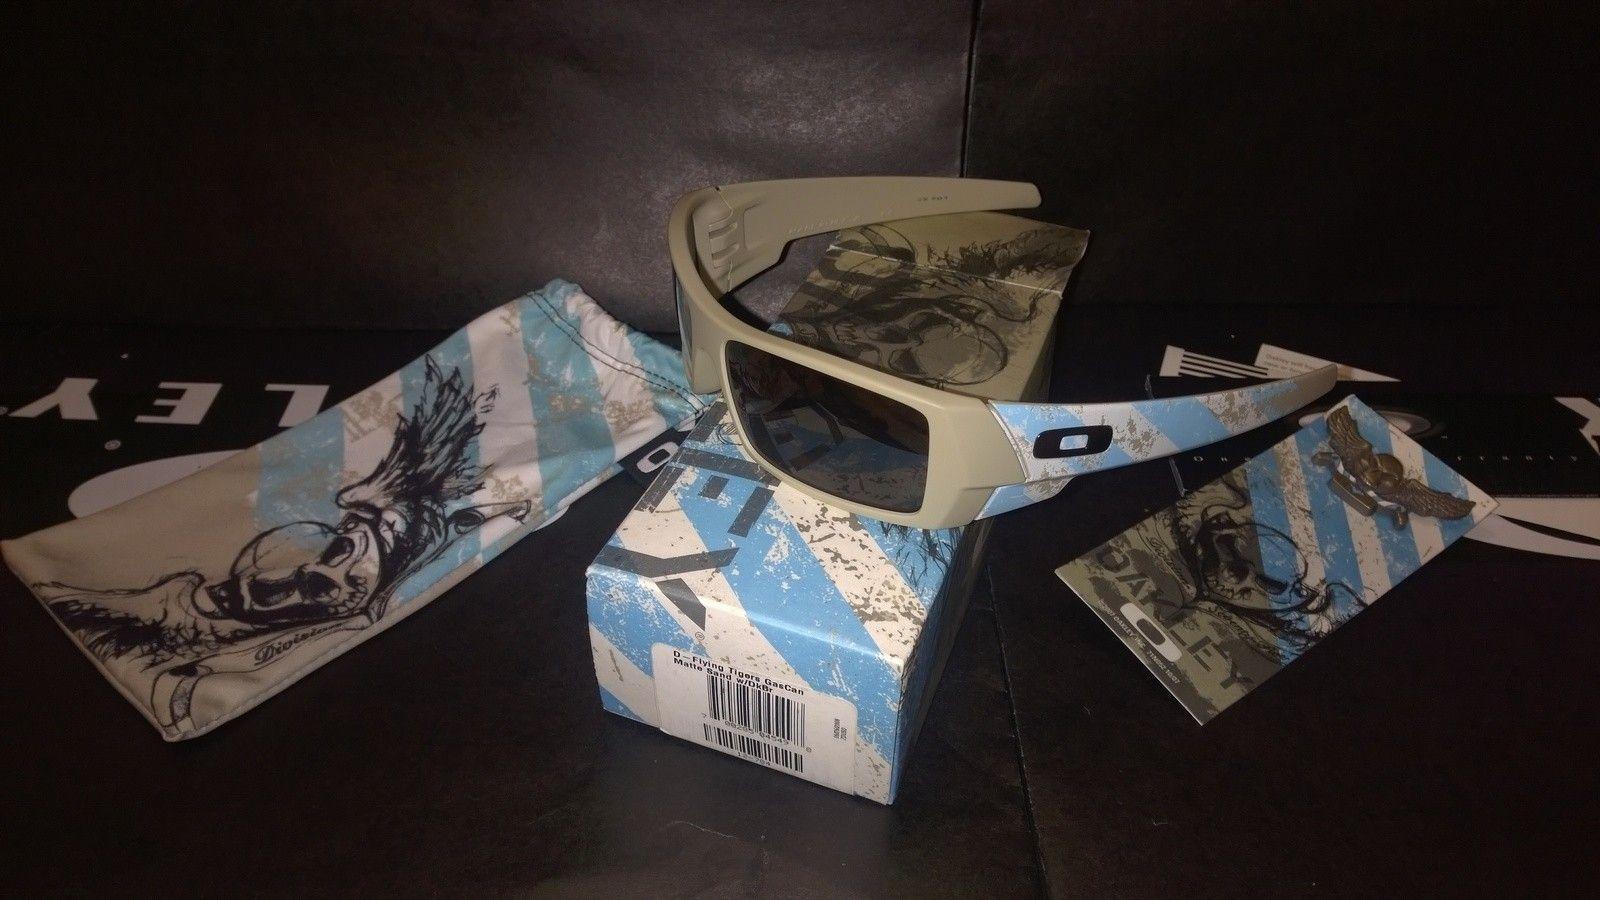 Flying Tigers Gascan  $190 / STPL Radar $210 / Half Wire XL / Vintage Razor Blades - WP_20150130_08_34_49_Pro.jpg